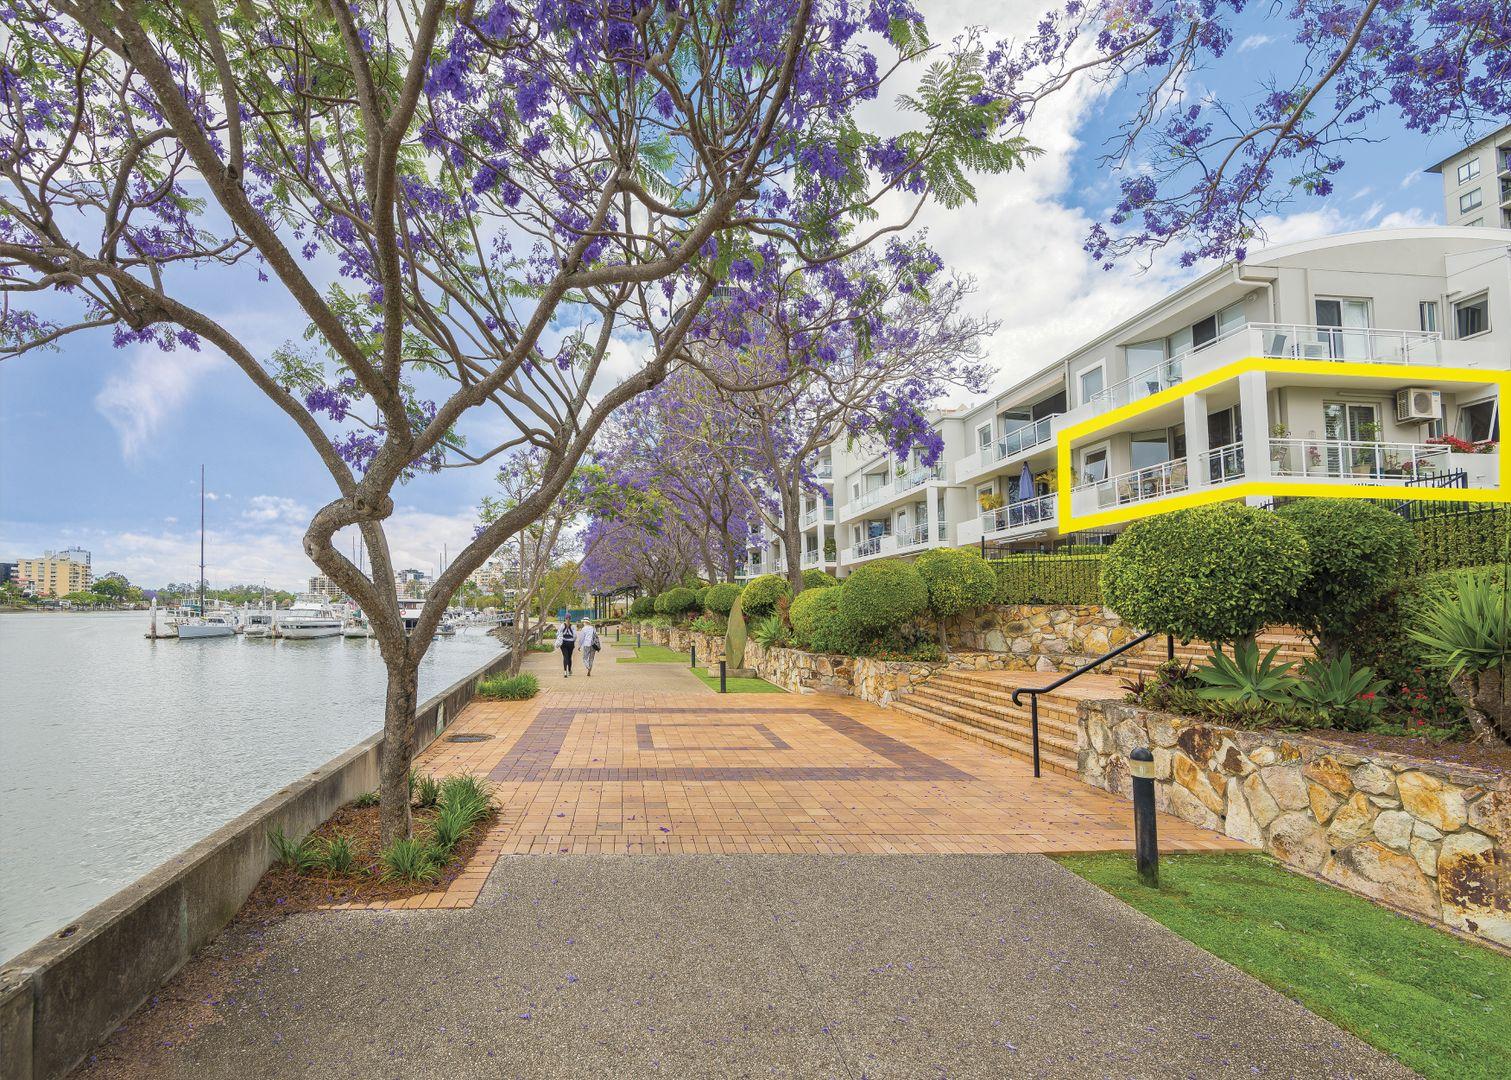 27/50 Rotherham Street, Kangaroo Point QLD 4169, Image 0